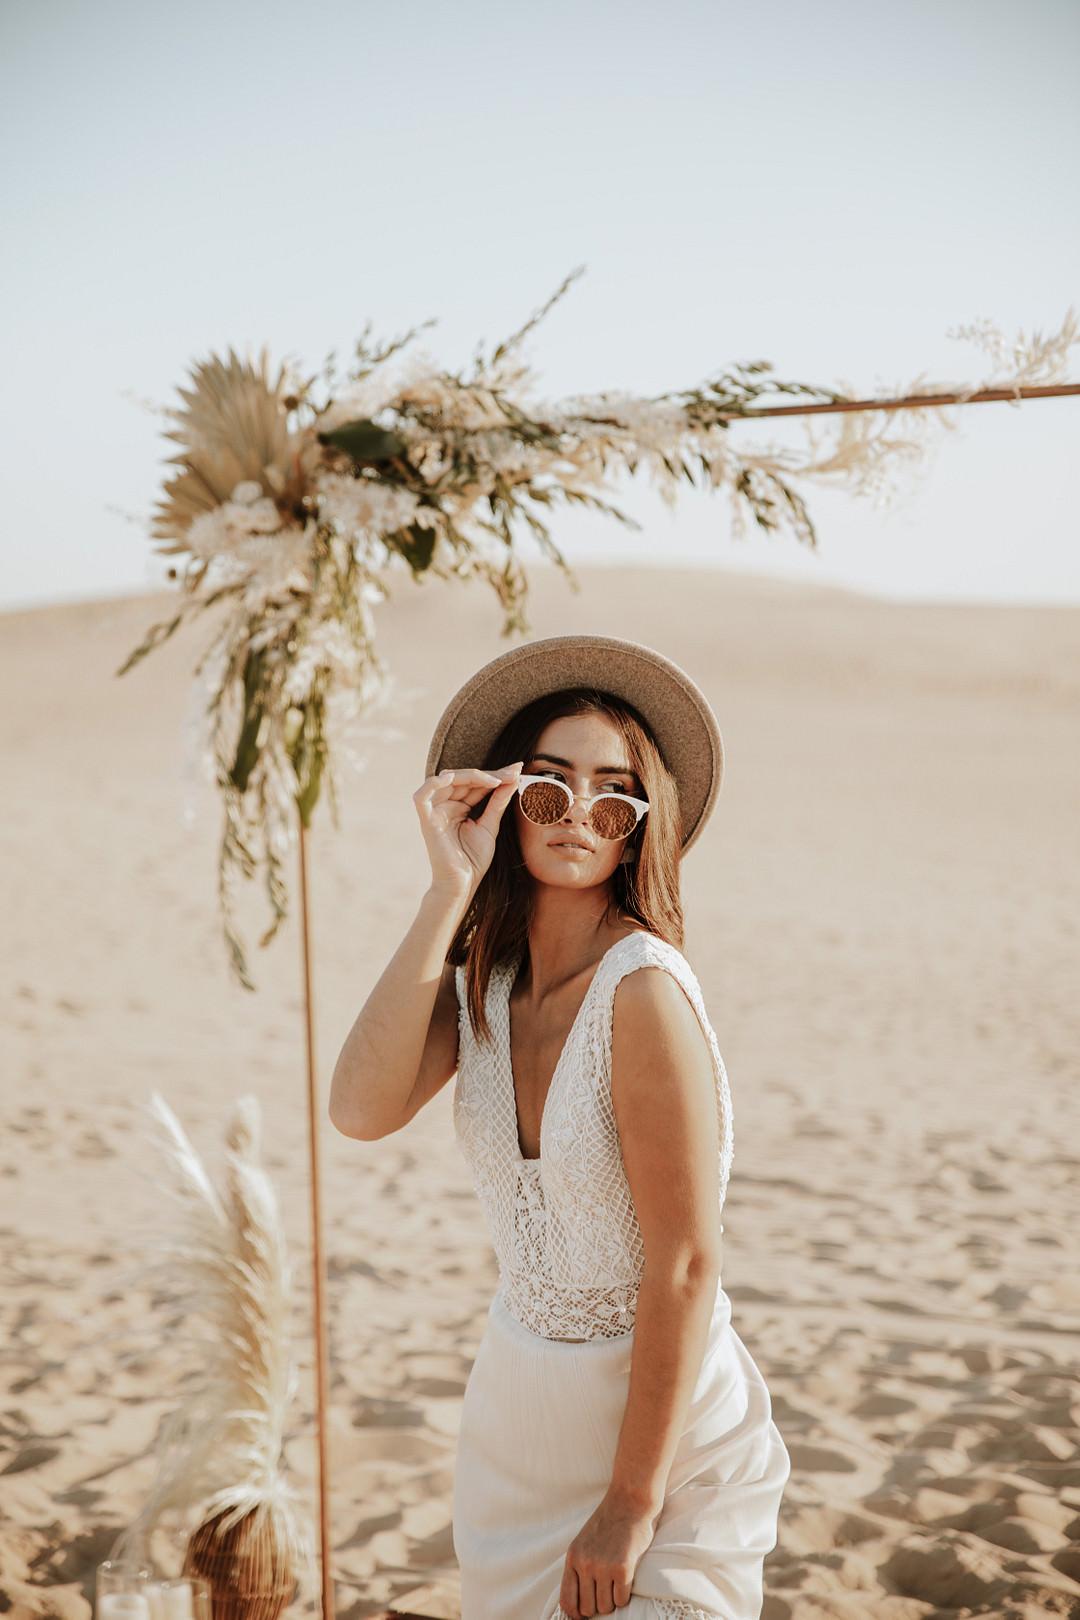 Sunglasses Bride Sand Dunes Wedding Photos By Gayle